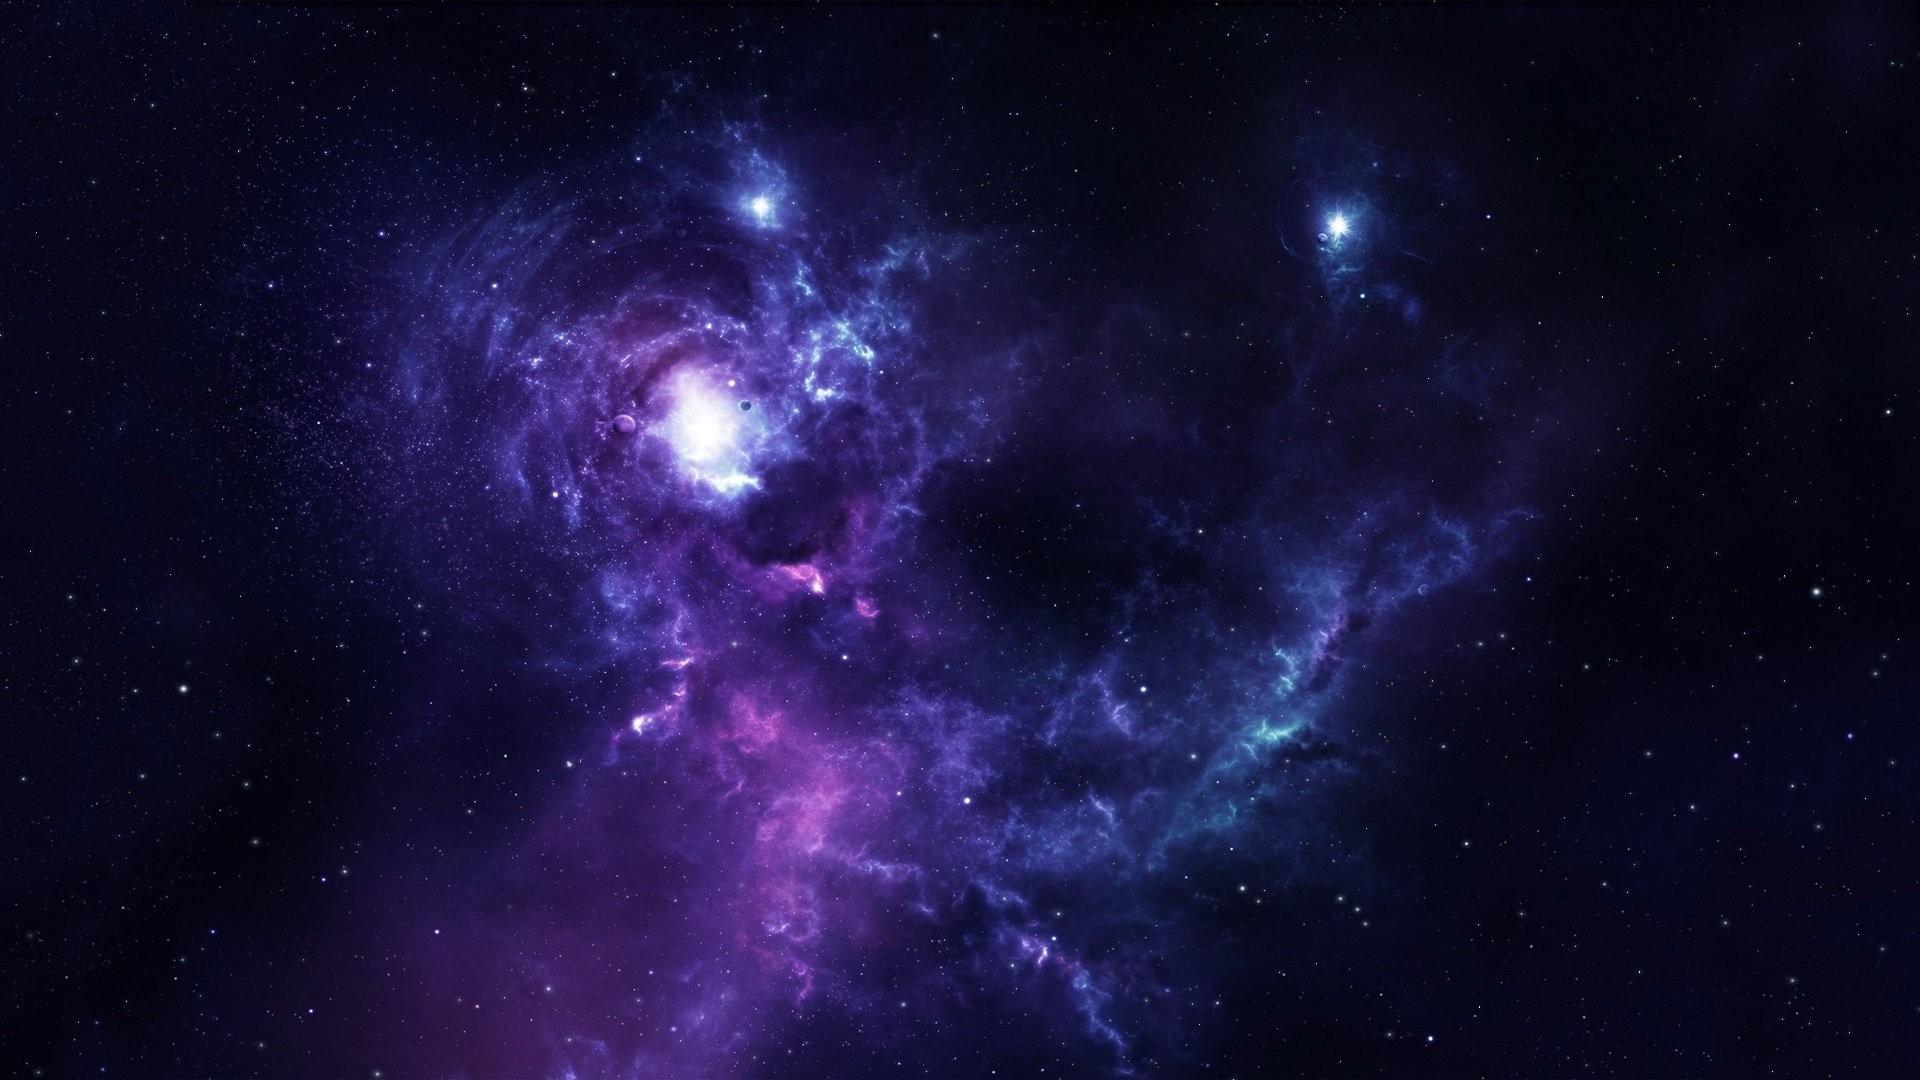 Explore Purple Wallpaper, Wallpaper Space, and more!